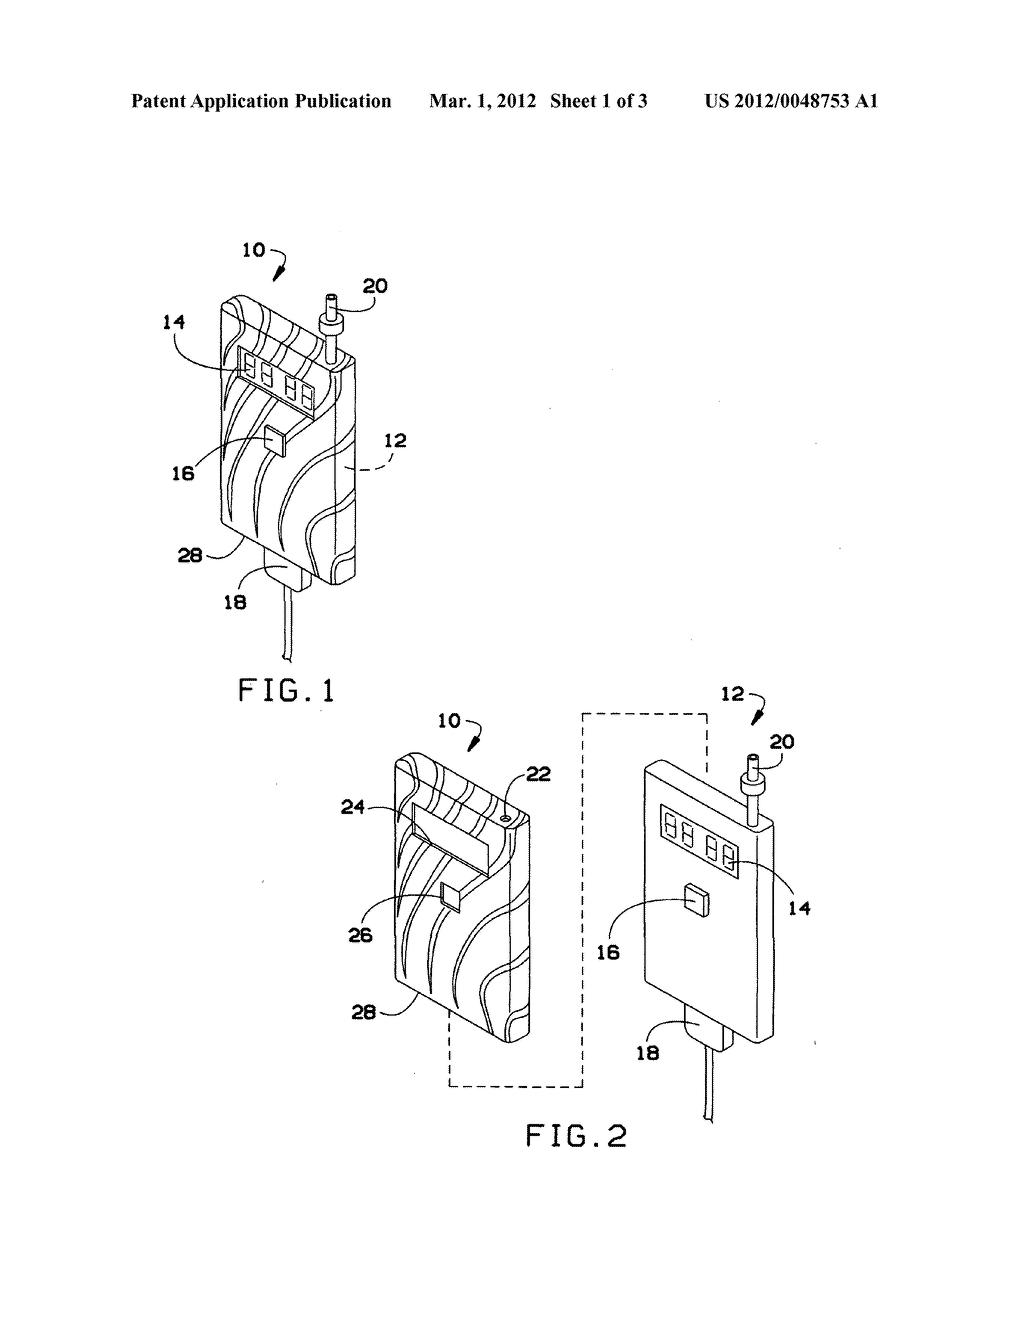 cover for breath alcohol ignition interlock device diagram draeger ignition  interlock cover for breath alcohol ignition